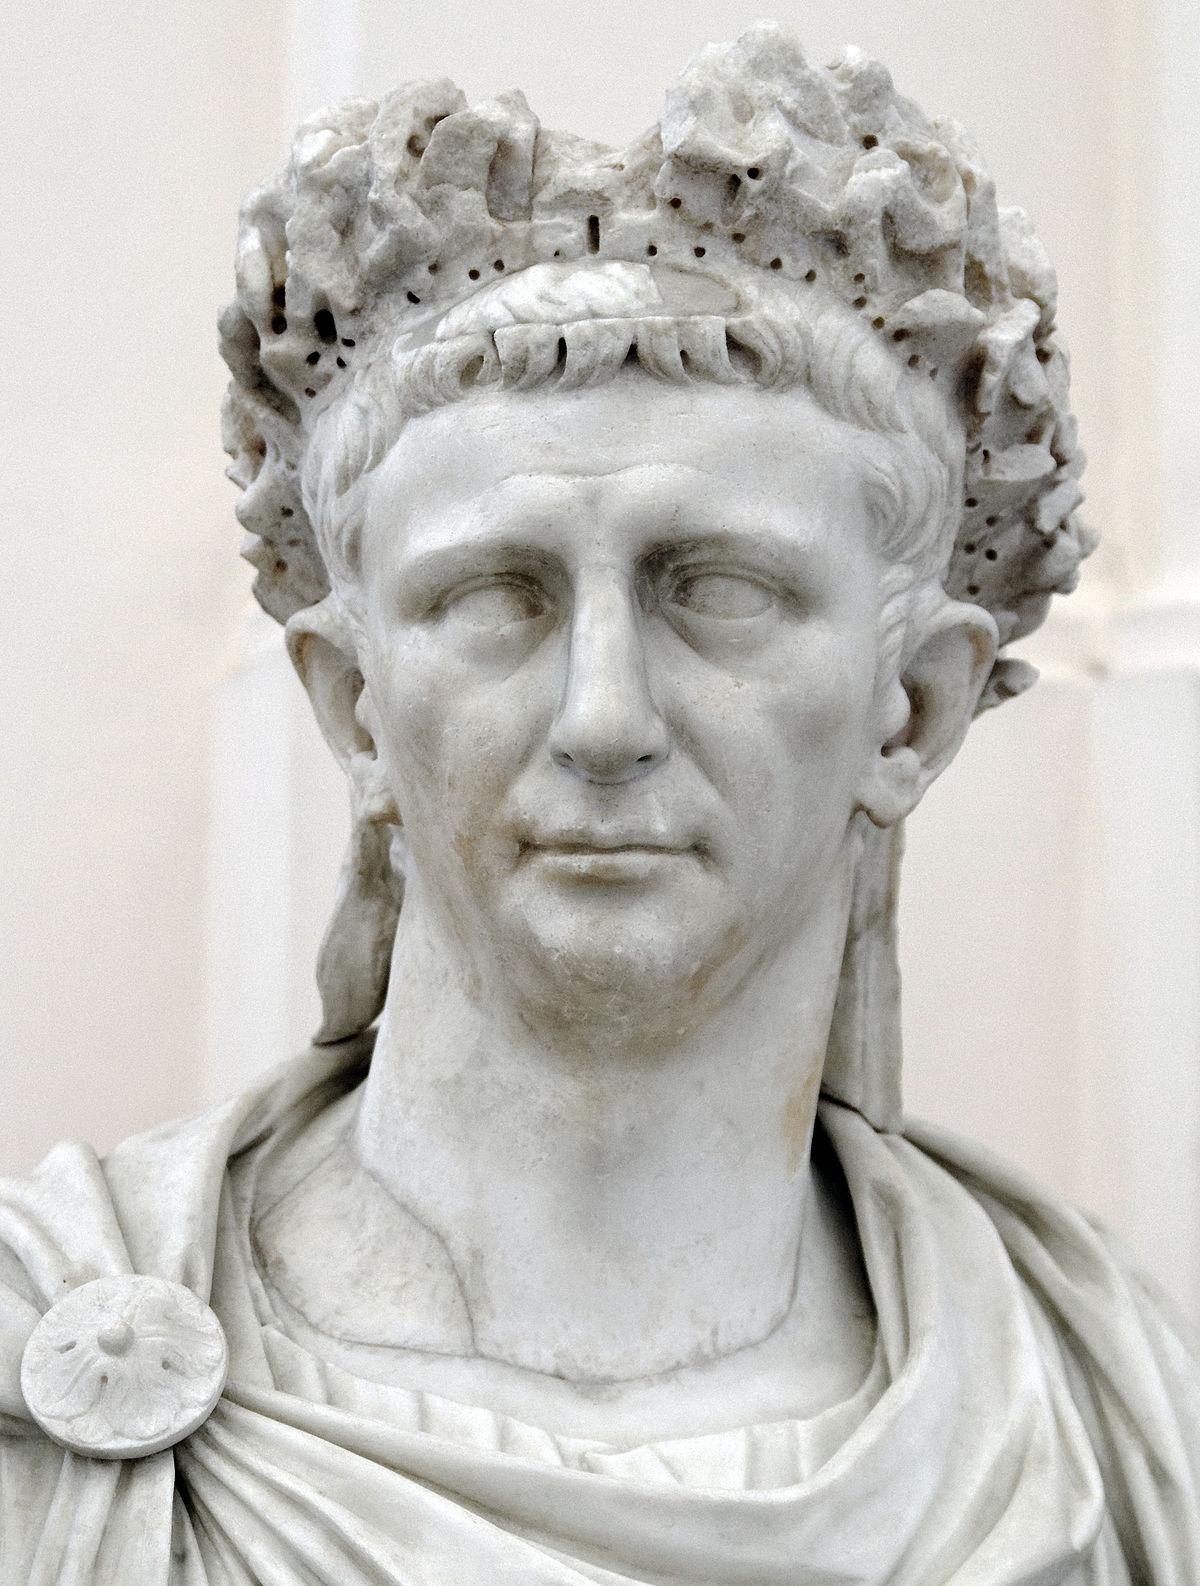 Tiberius Claudius Caesar Augustus Germanicus ile ilgili görsel sonucu